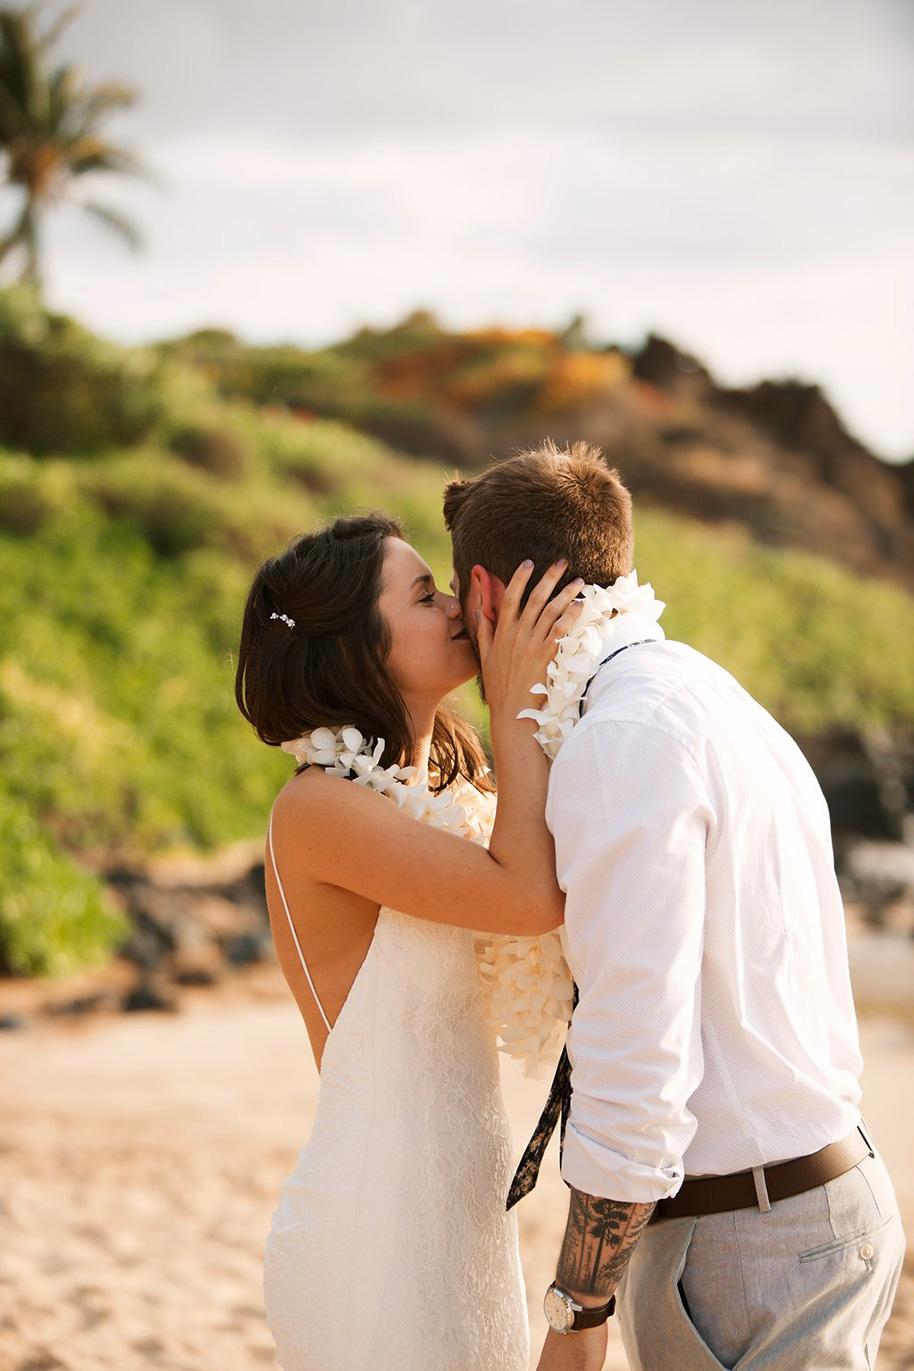 Maui-Beach-Wedding-070616-7